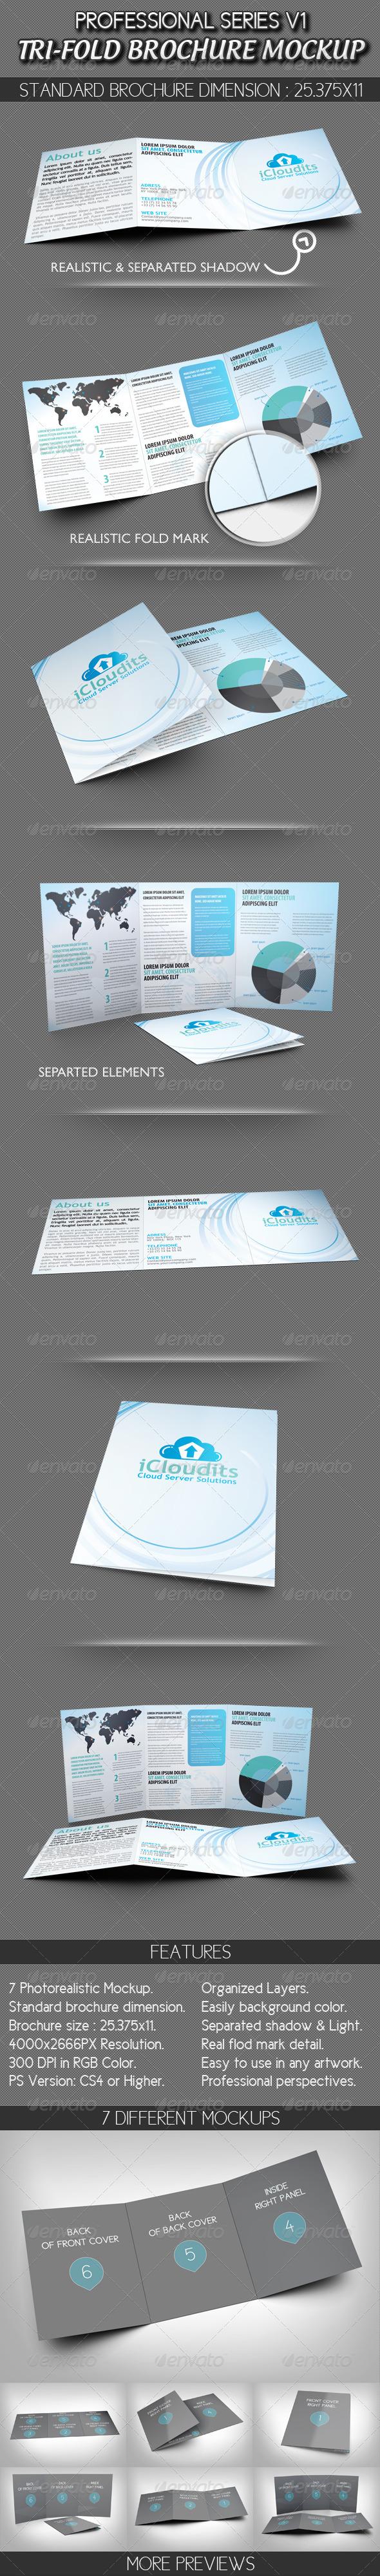 GraphicRiver Professional Tri-fold Brochure Mockup V1 2773495